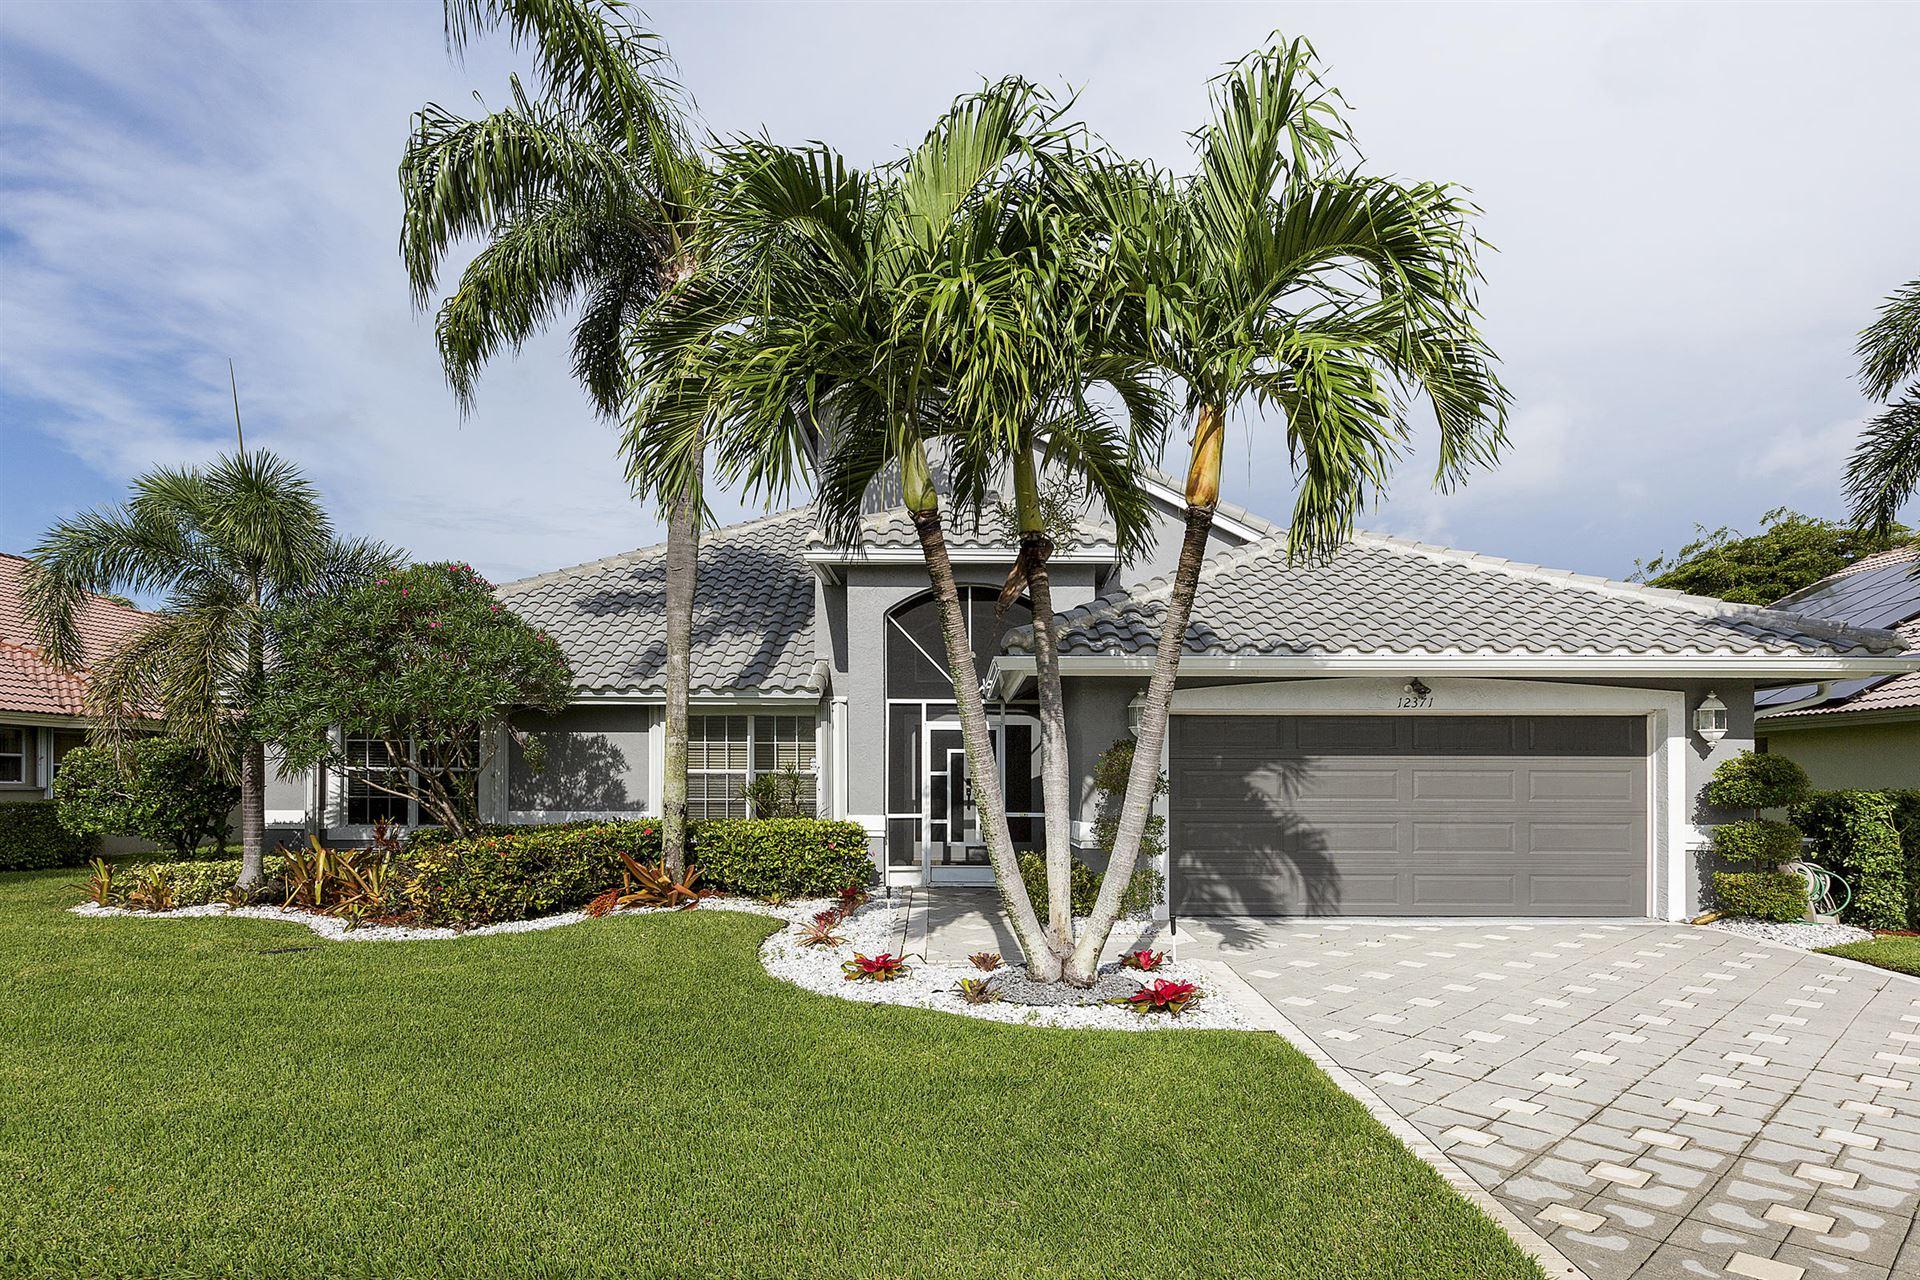 12371 Divot Drive, Boynton Beach, FL 33437 - #: RX-10672688